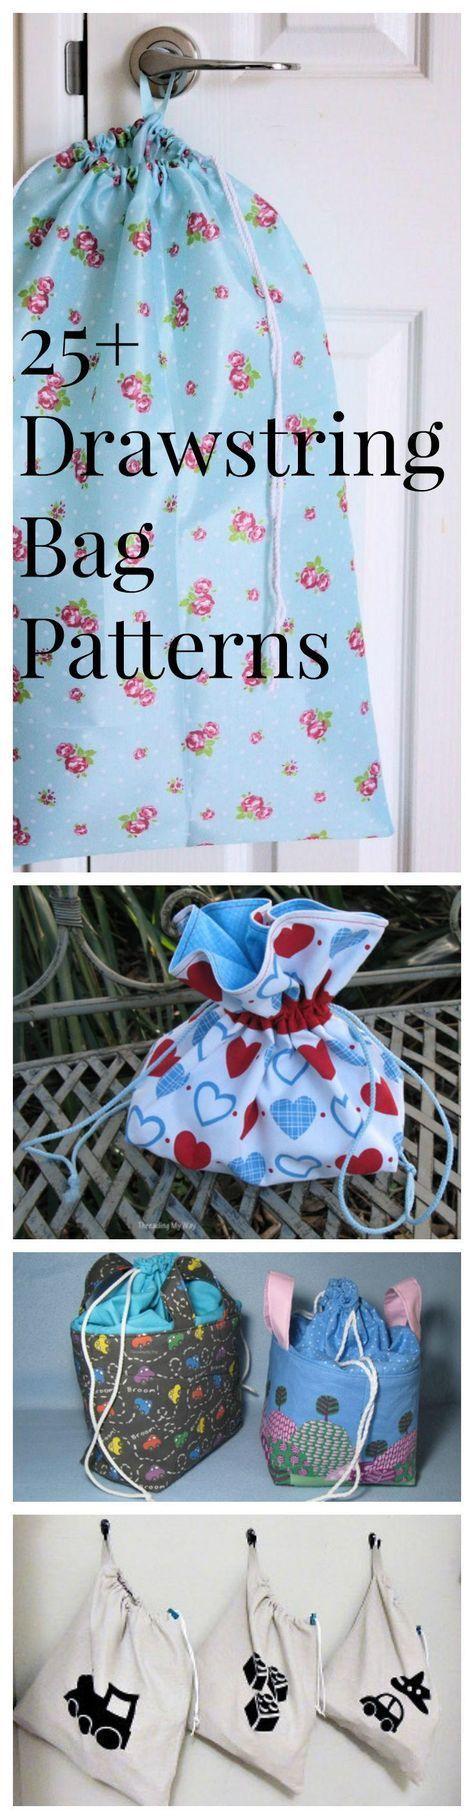 How to Make a Drawstring Bag Tutorials and Drawstring Bag Patterns | AllFreeSewing.com